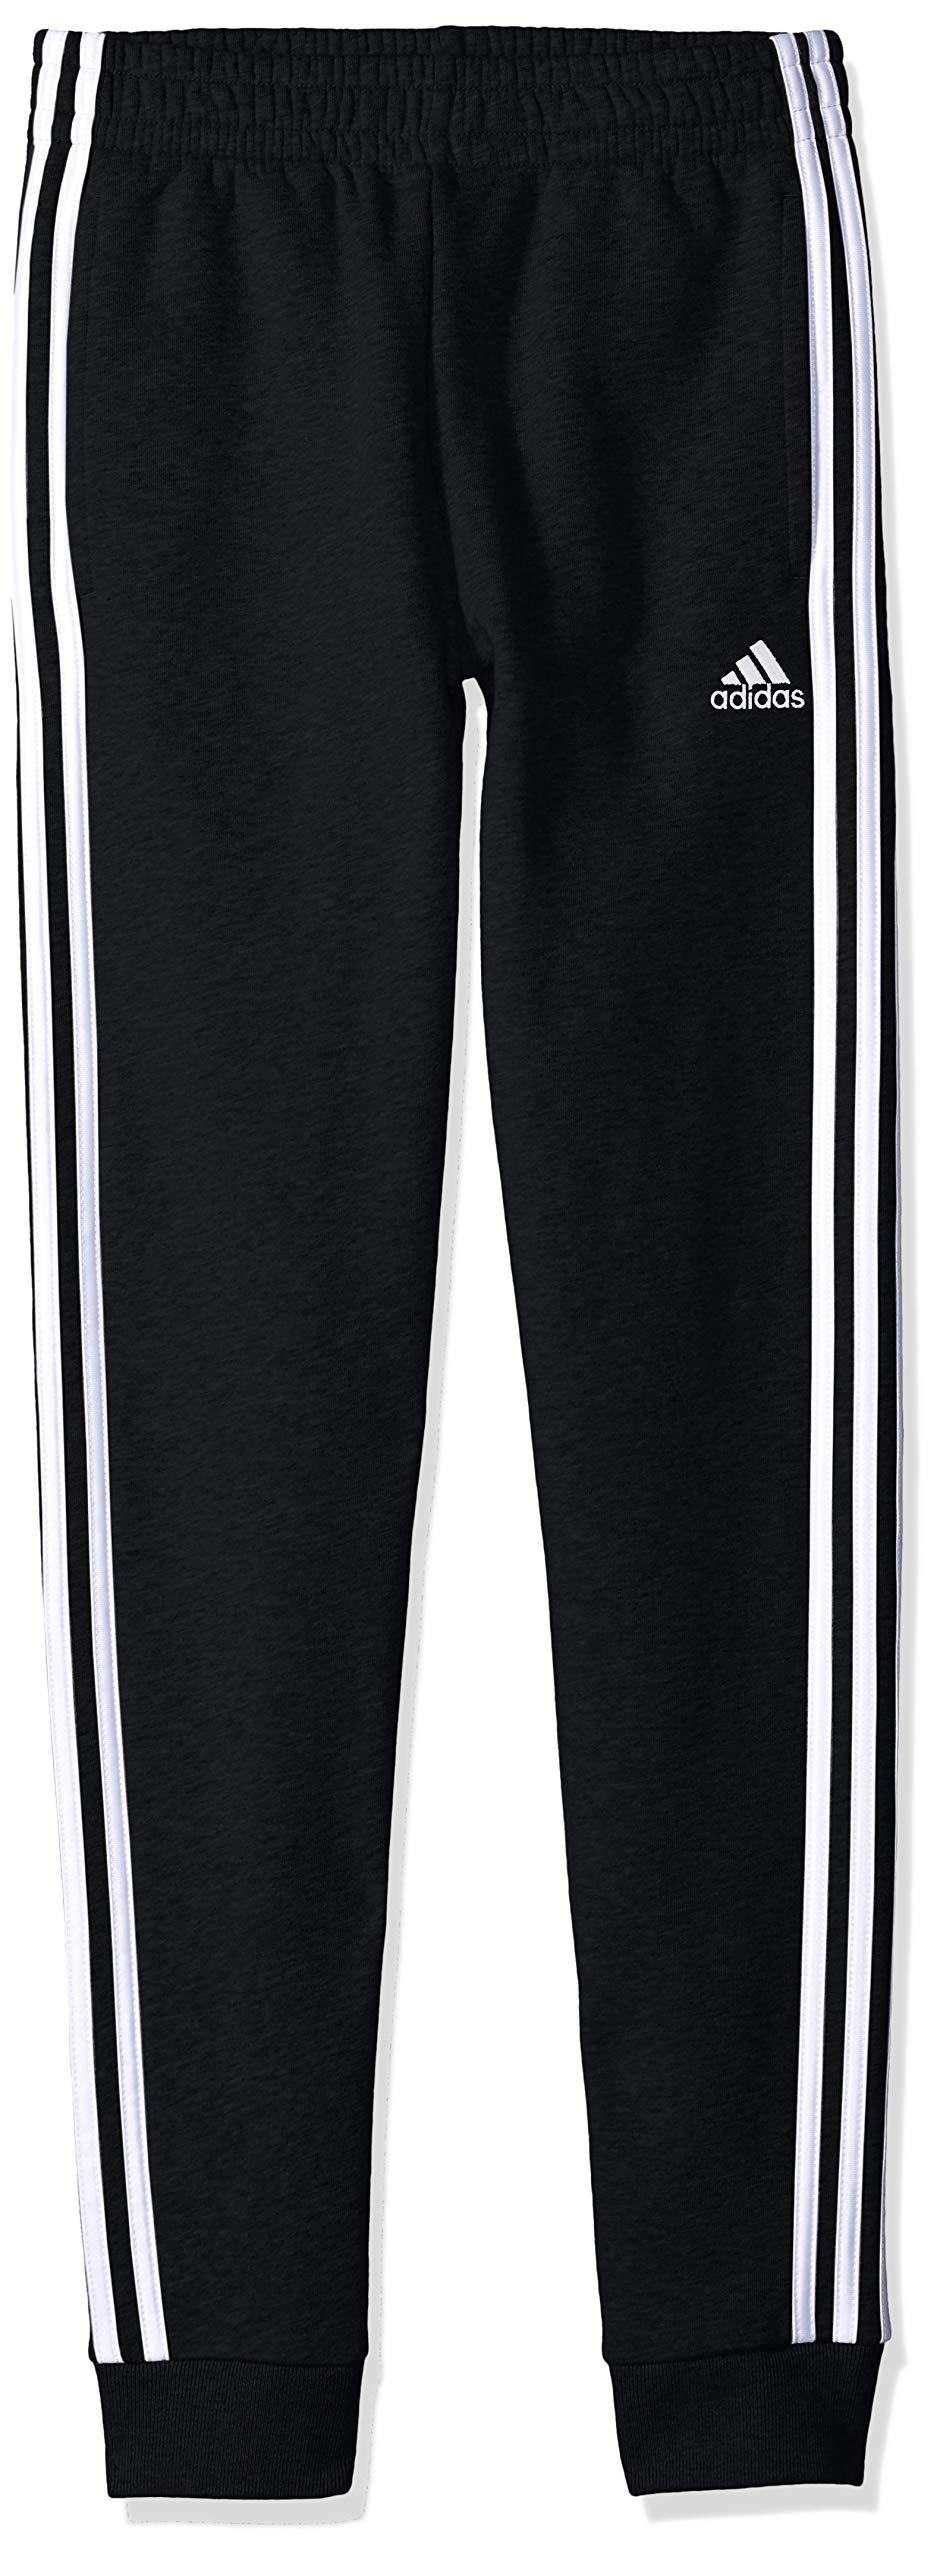 adidas Boys' Big Fleece Jogger Pant, Focus Black, S (8)